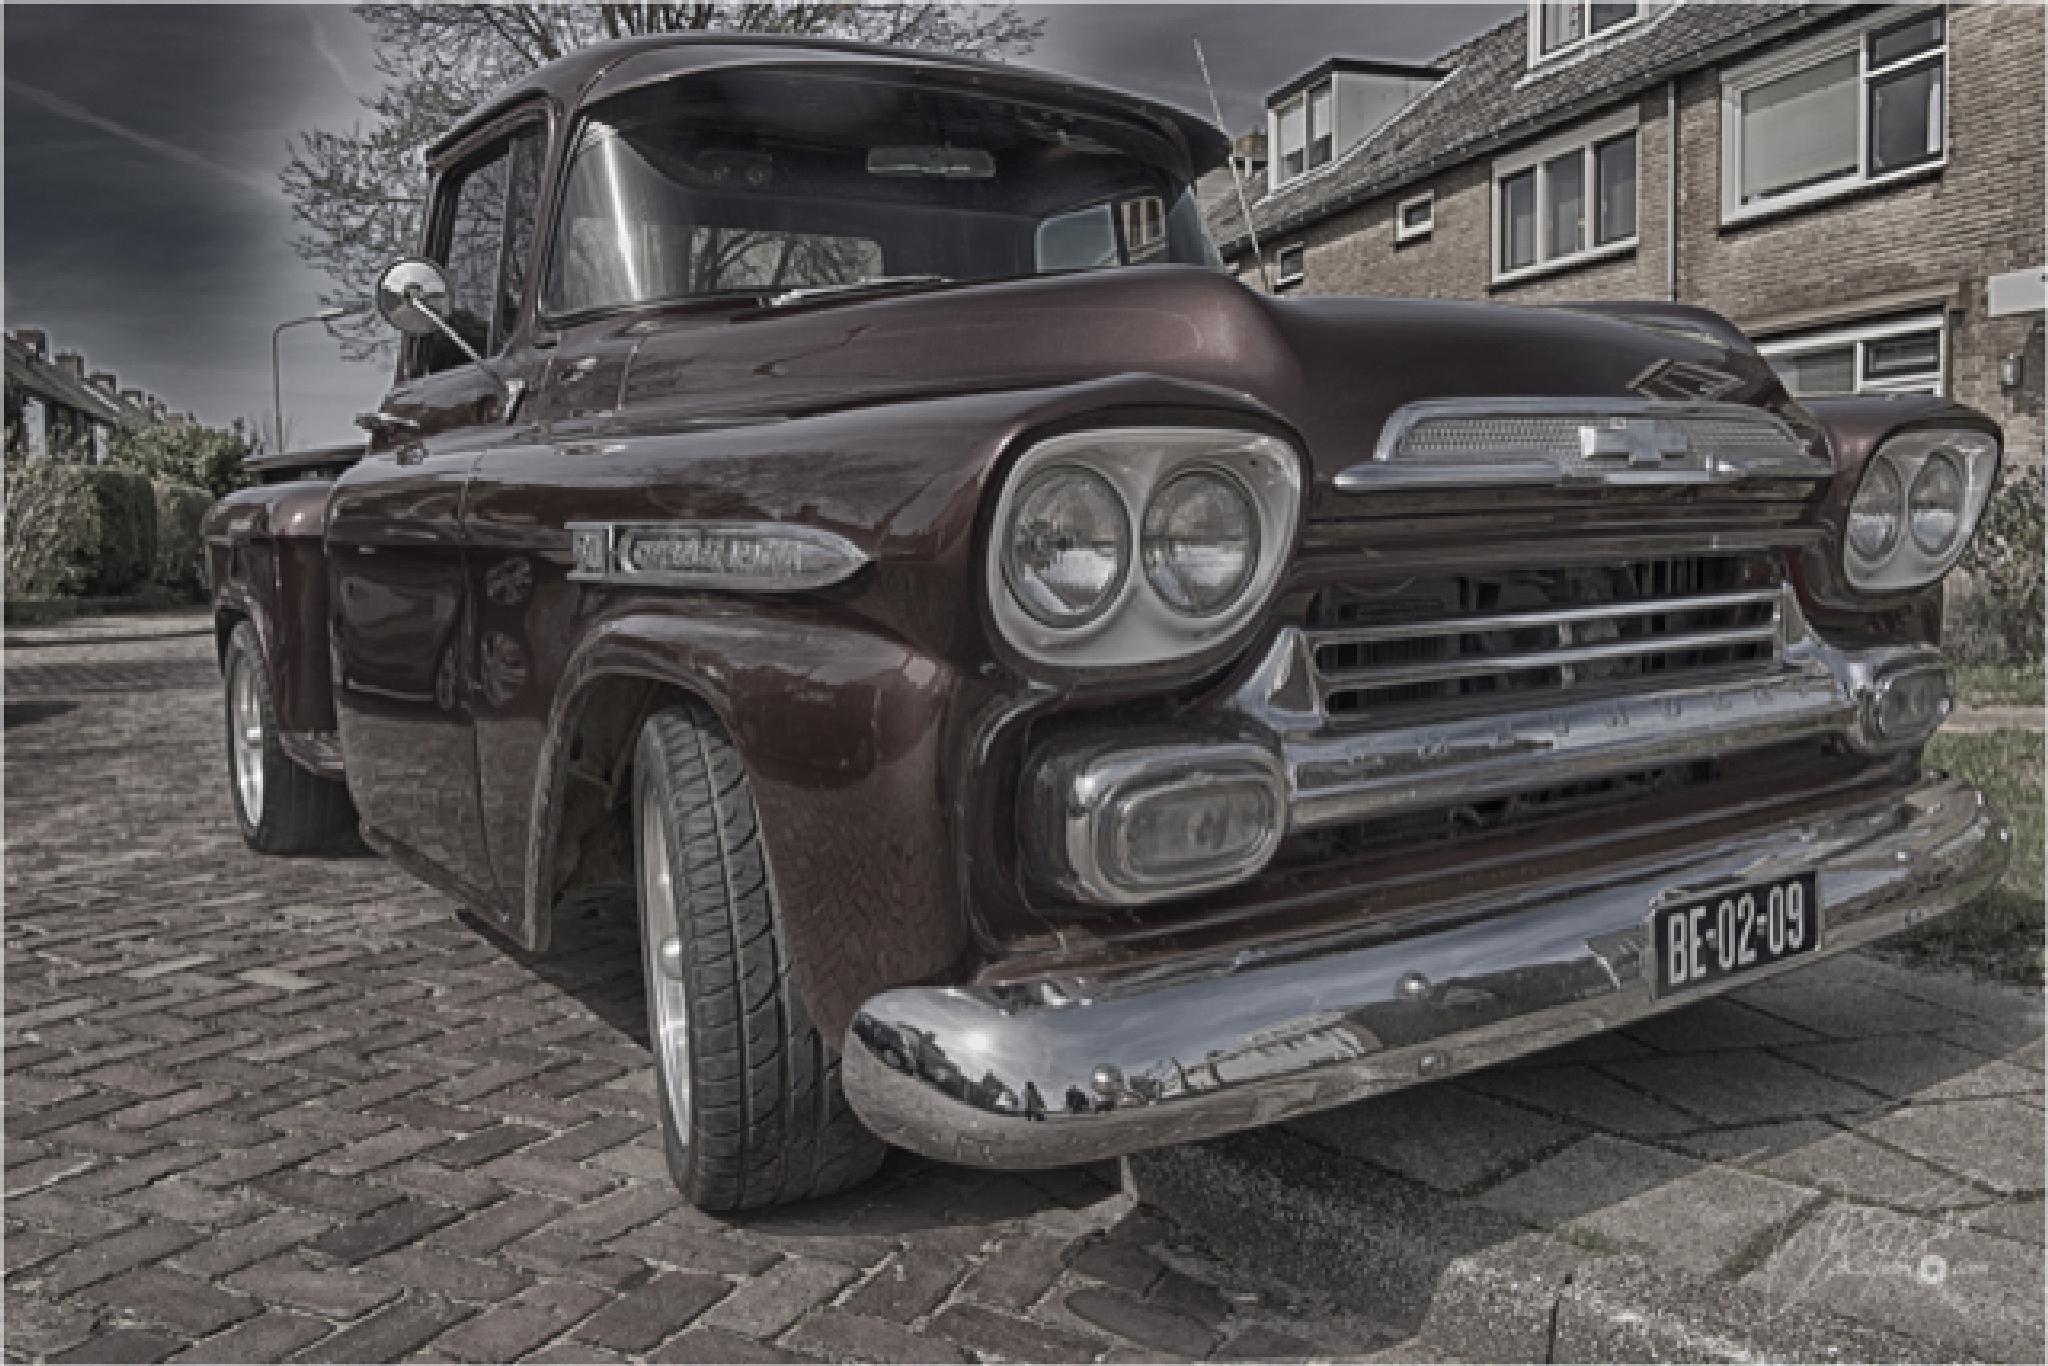 Chevy '59 by hans.adrichem